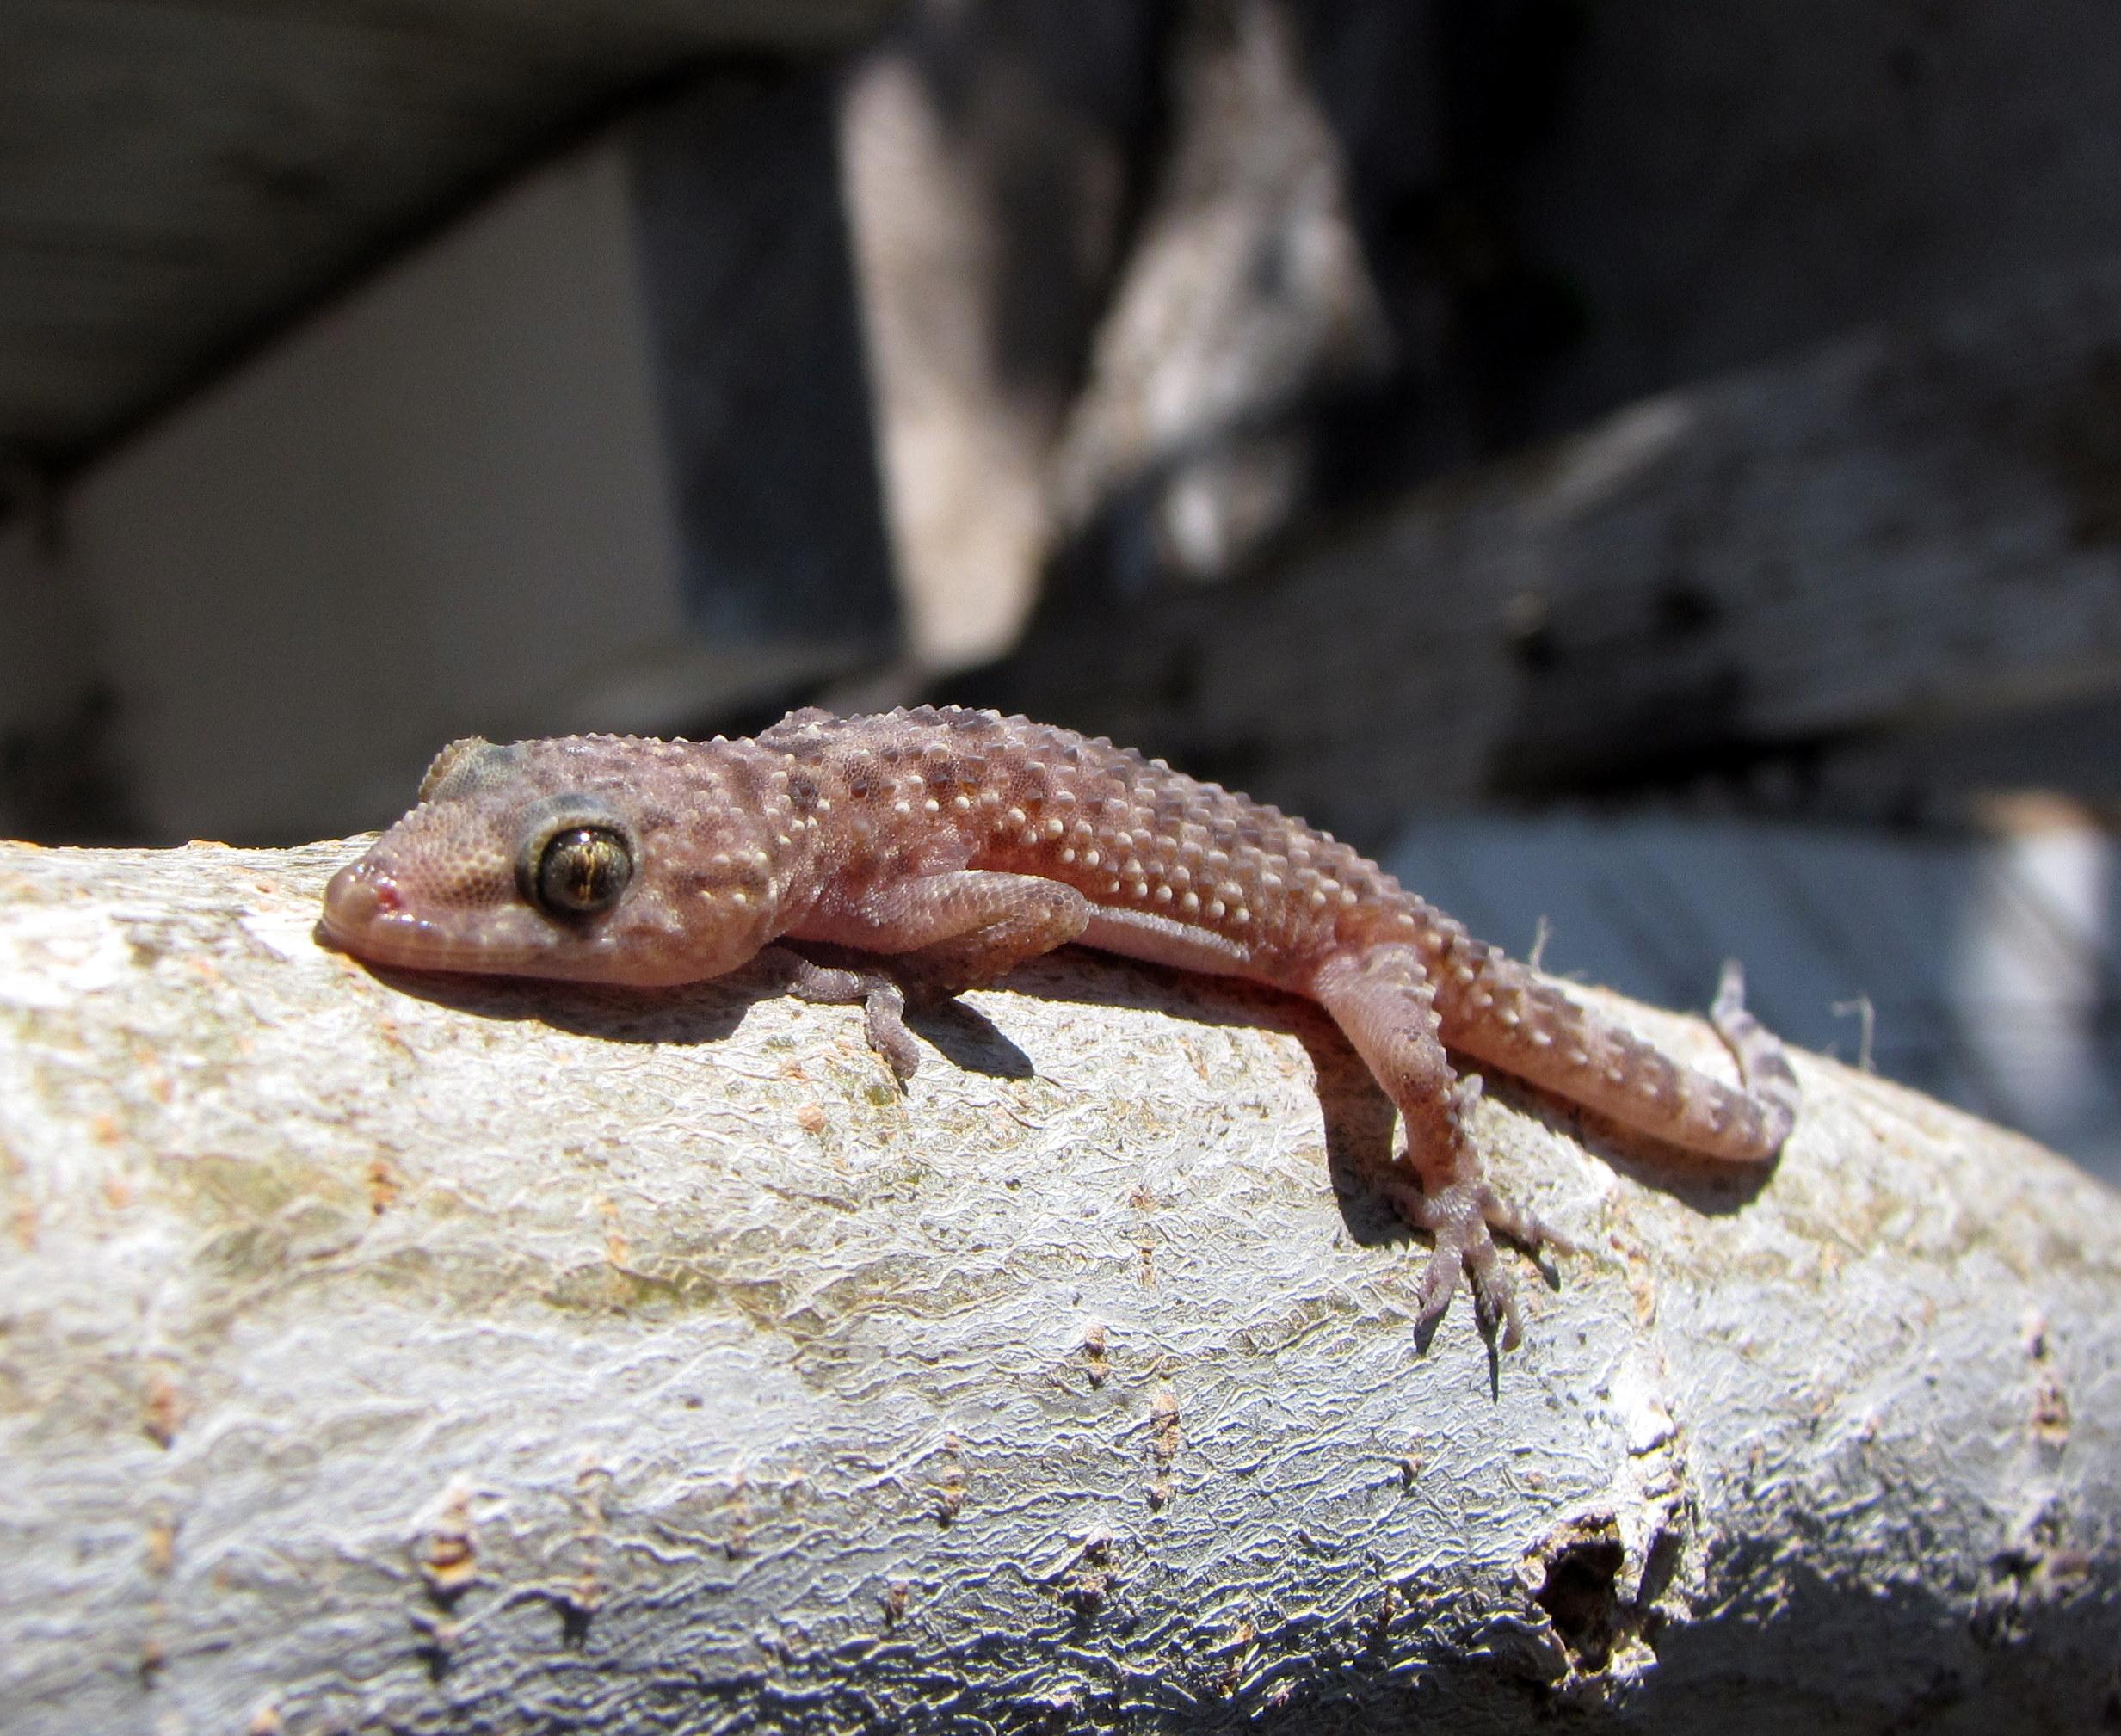 Mediterranean Gecko (Hemidactylus turcicus)